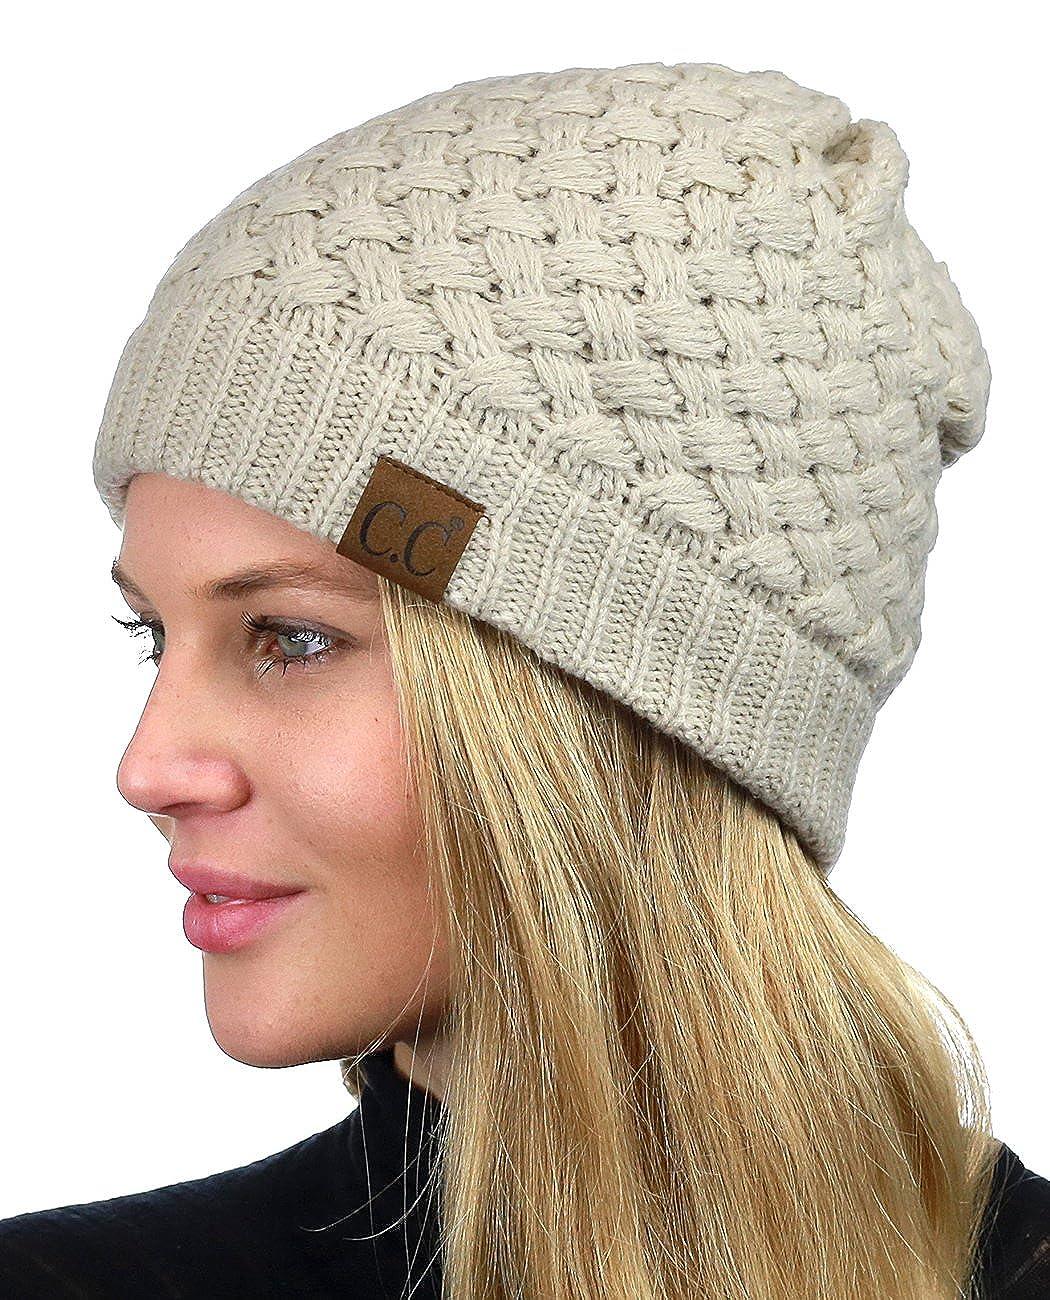 C.C Basketweave Knit Warm Inner Lined Soft Stretch Skully Beanie Hat Beige HAT47-BG